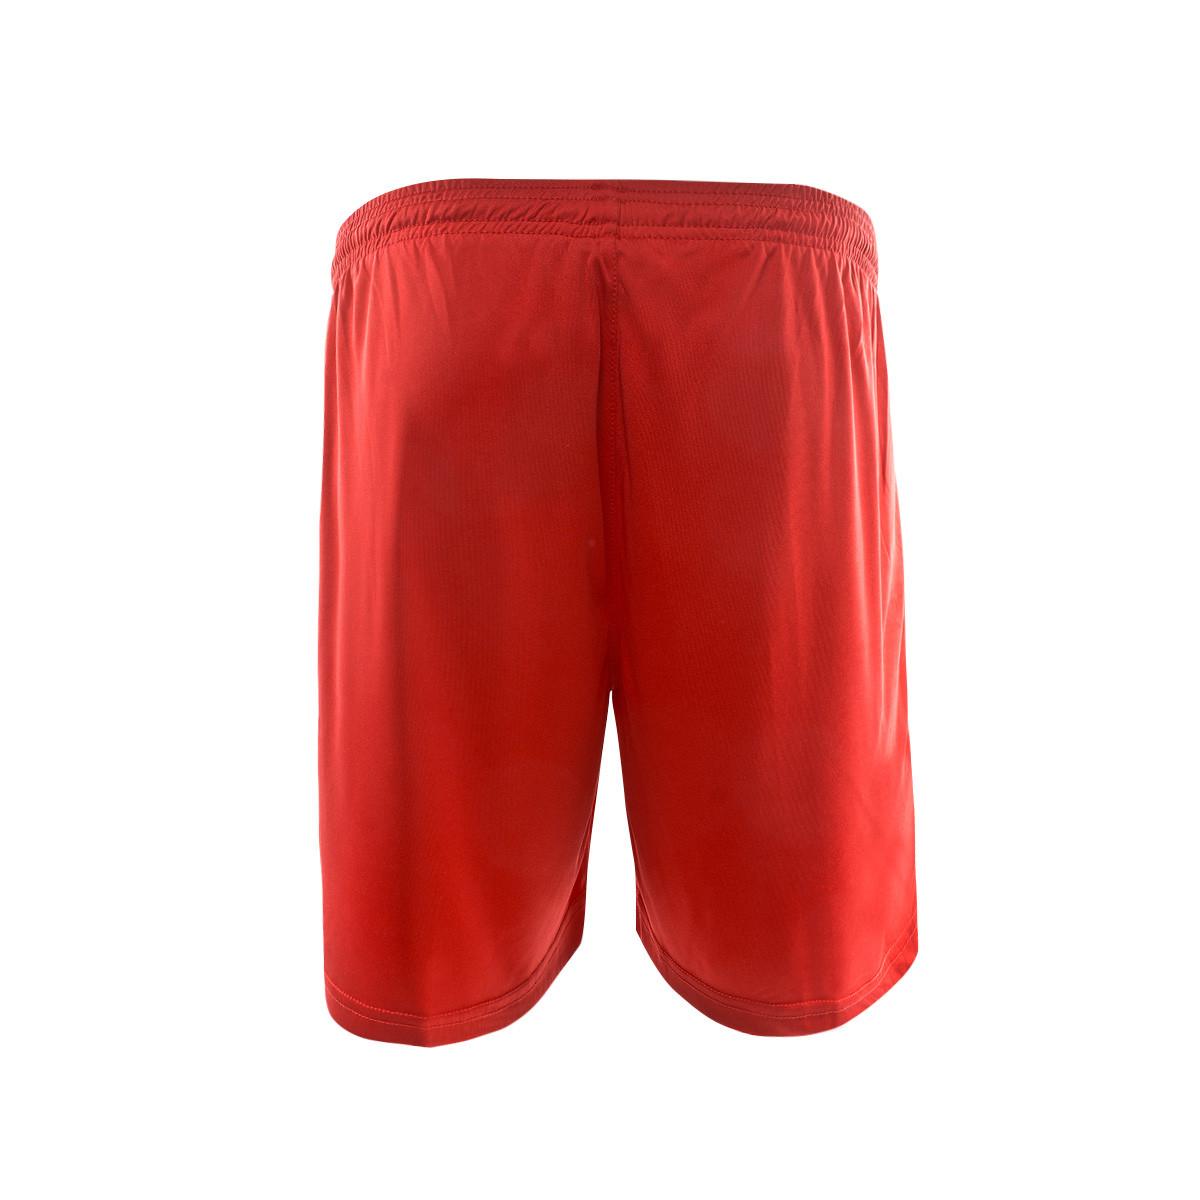 la mejor actitud 83530 e3628 Pantalón corto SP Fútbol Valor